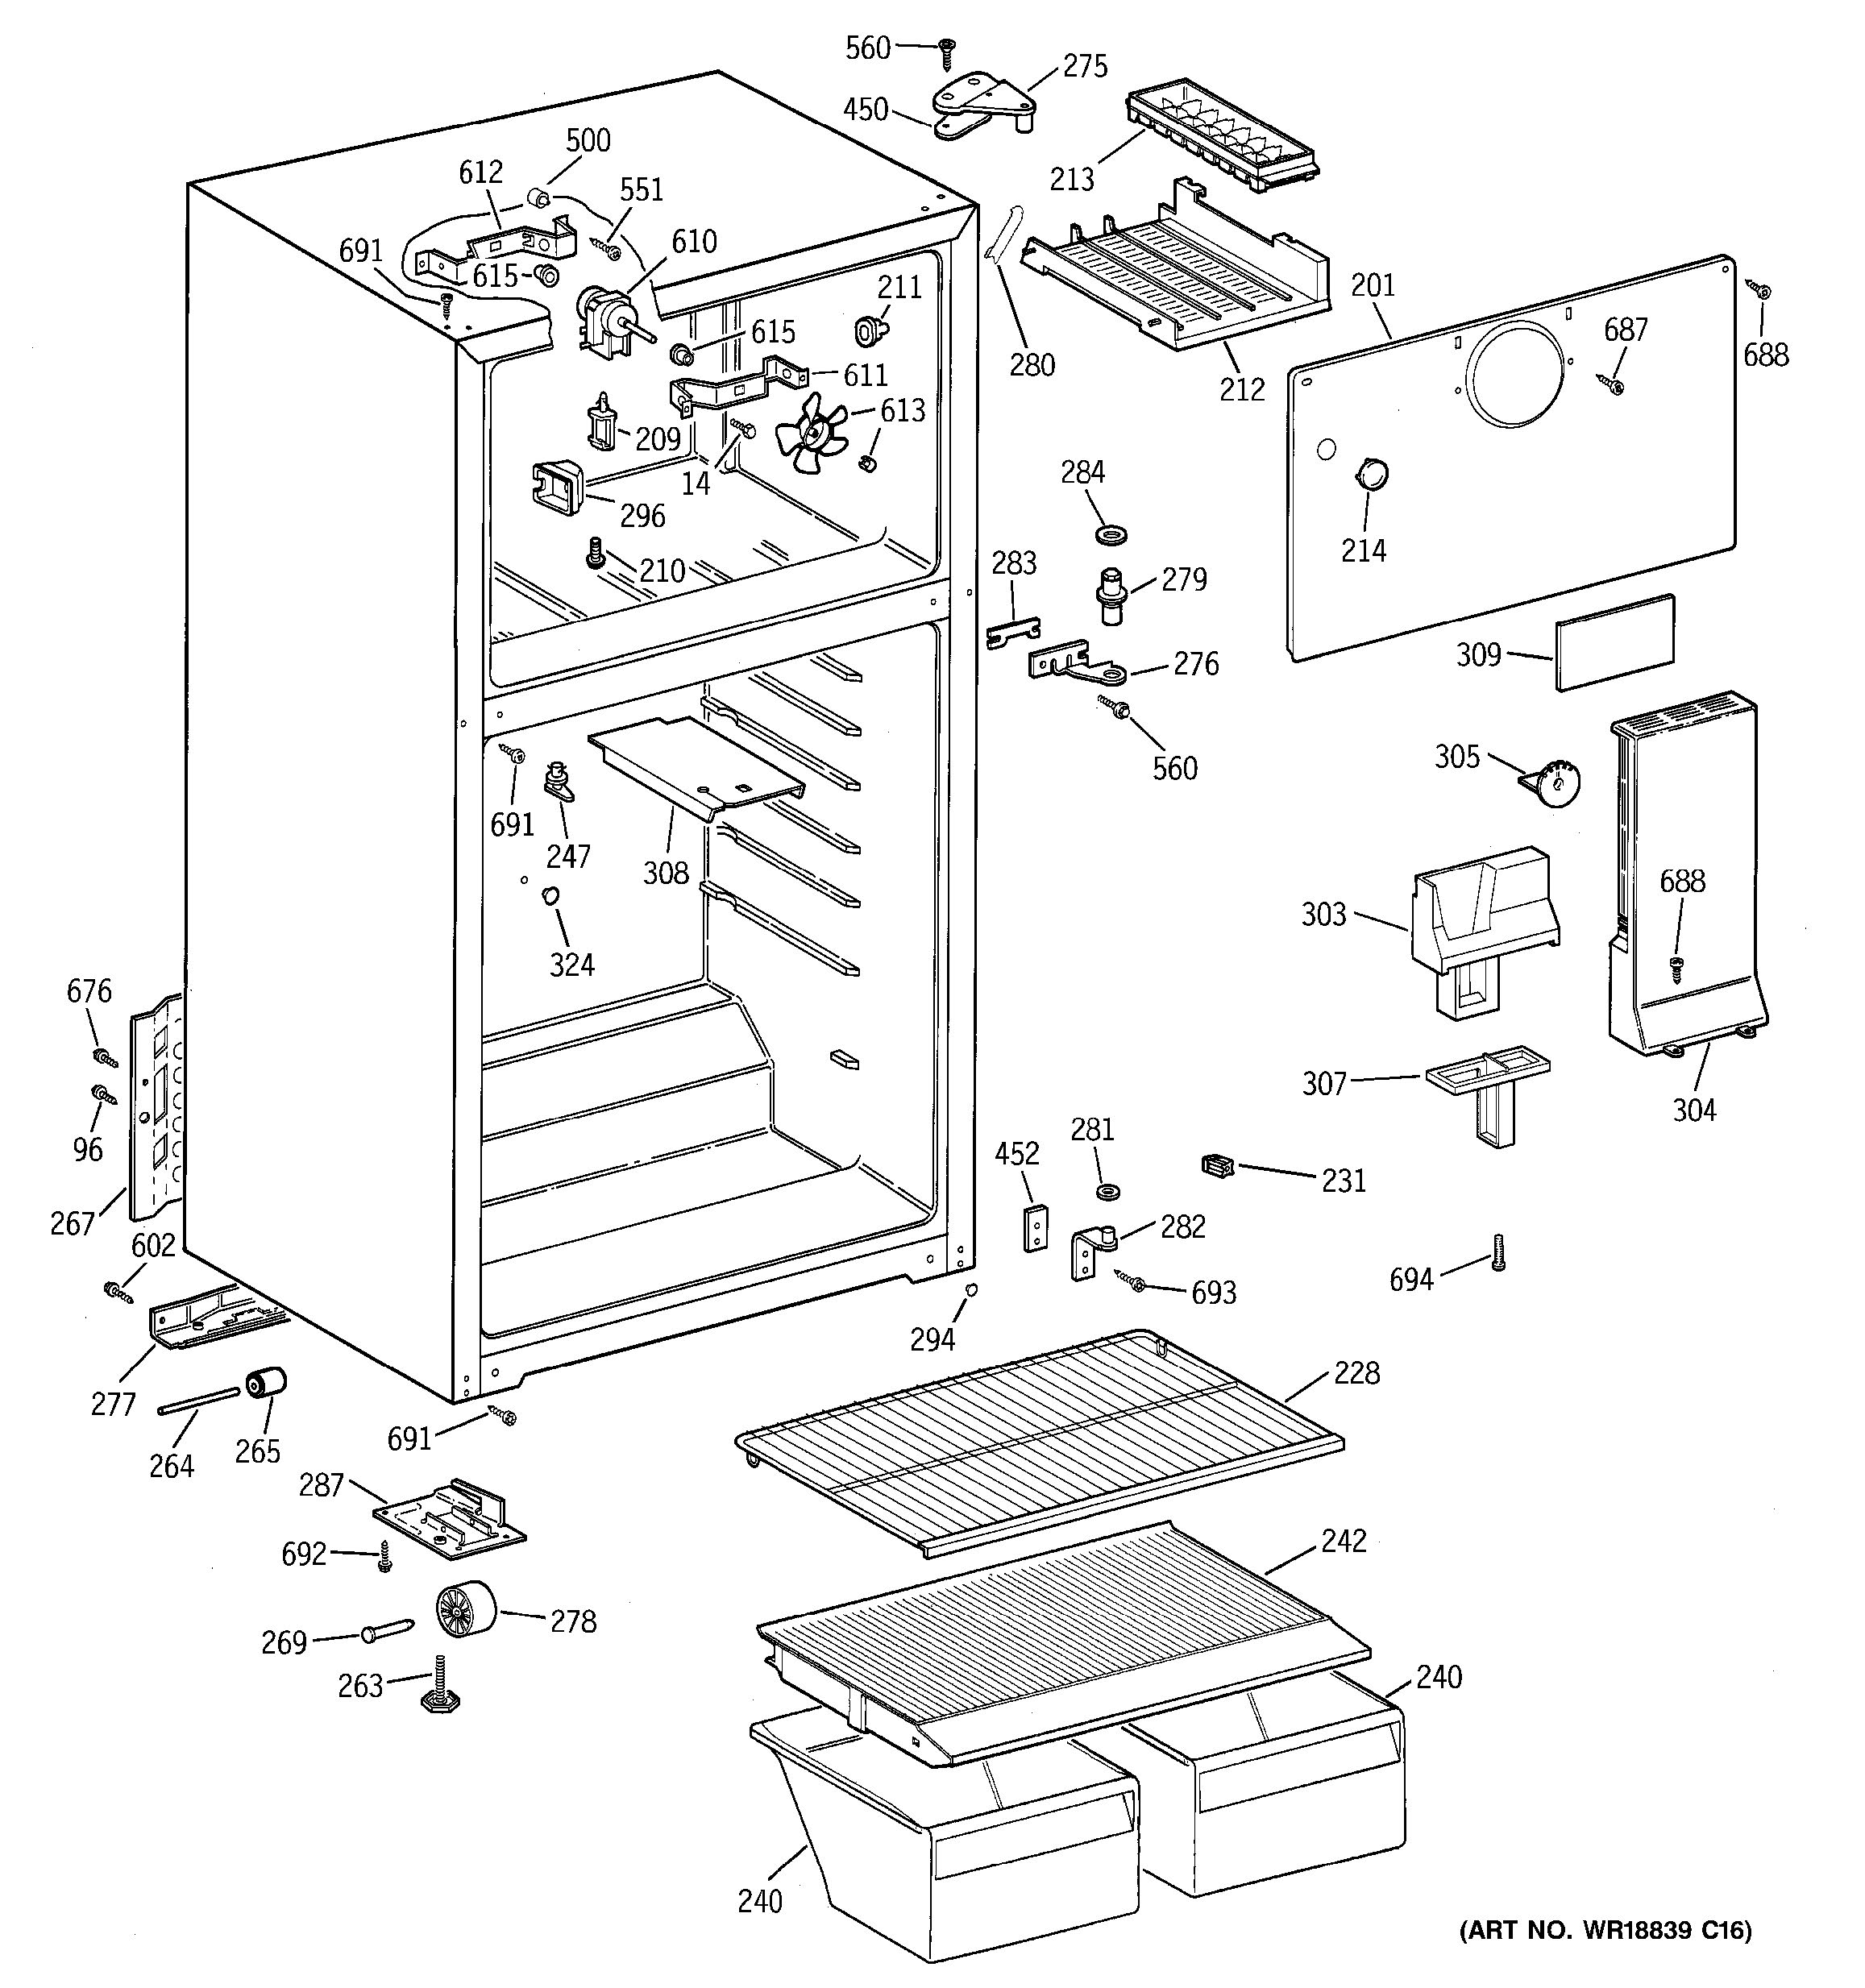 strain gauge wiring diagram duncan designed wire for ge refrigerator model 22 25 diagrams